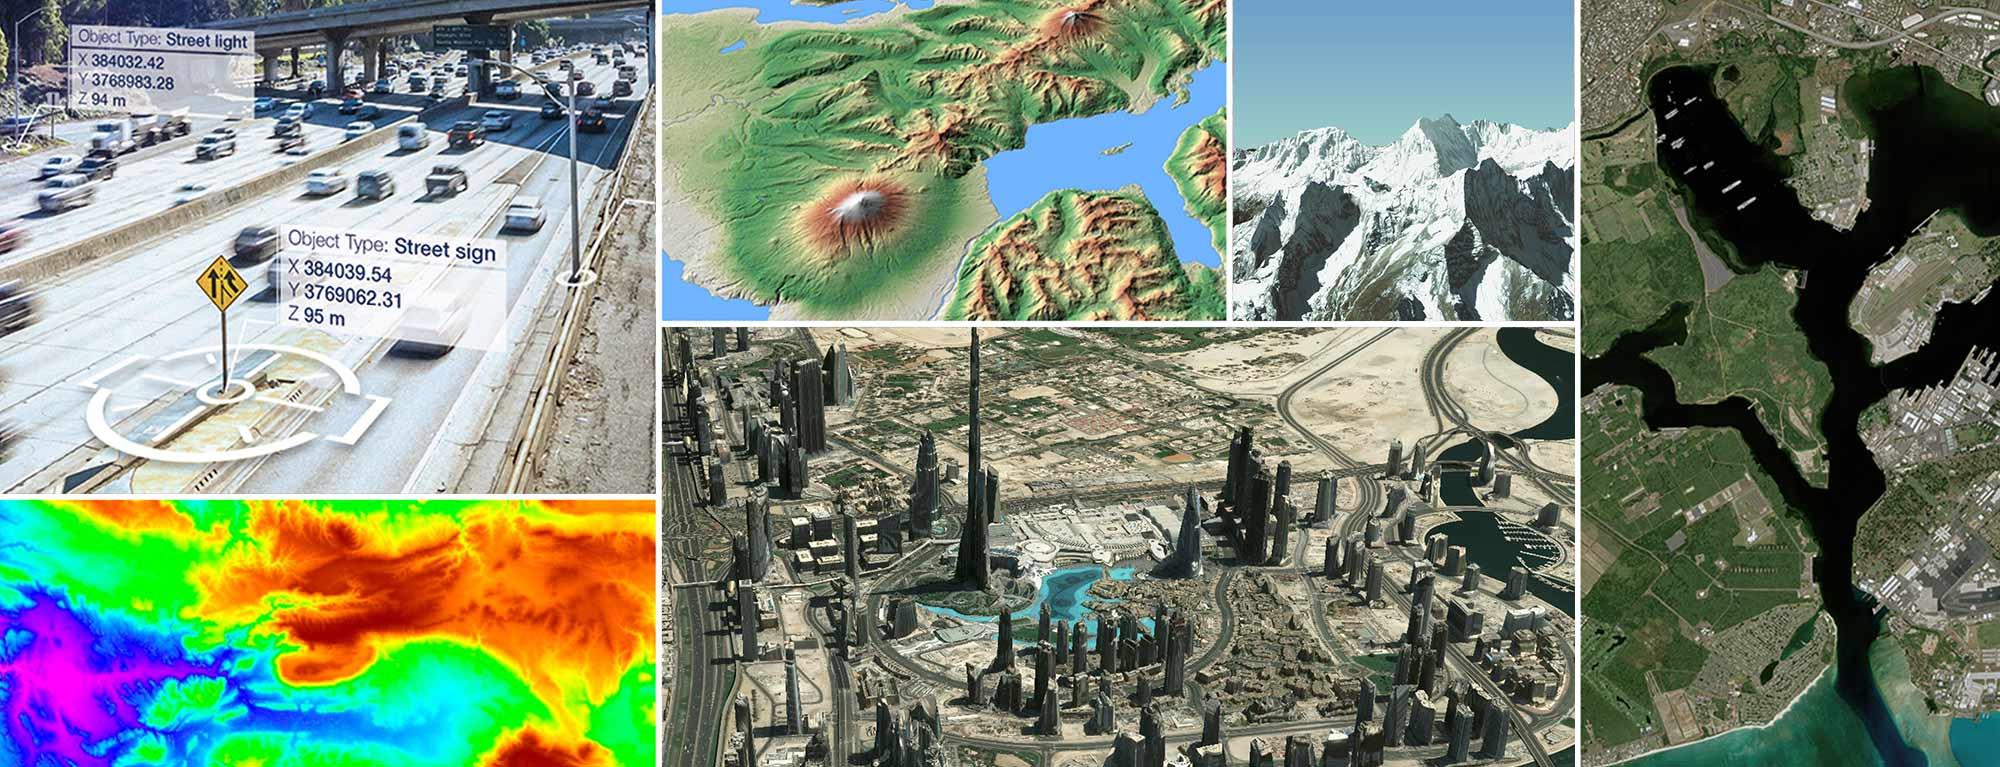 Mosaic images satellite